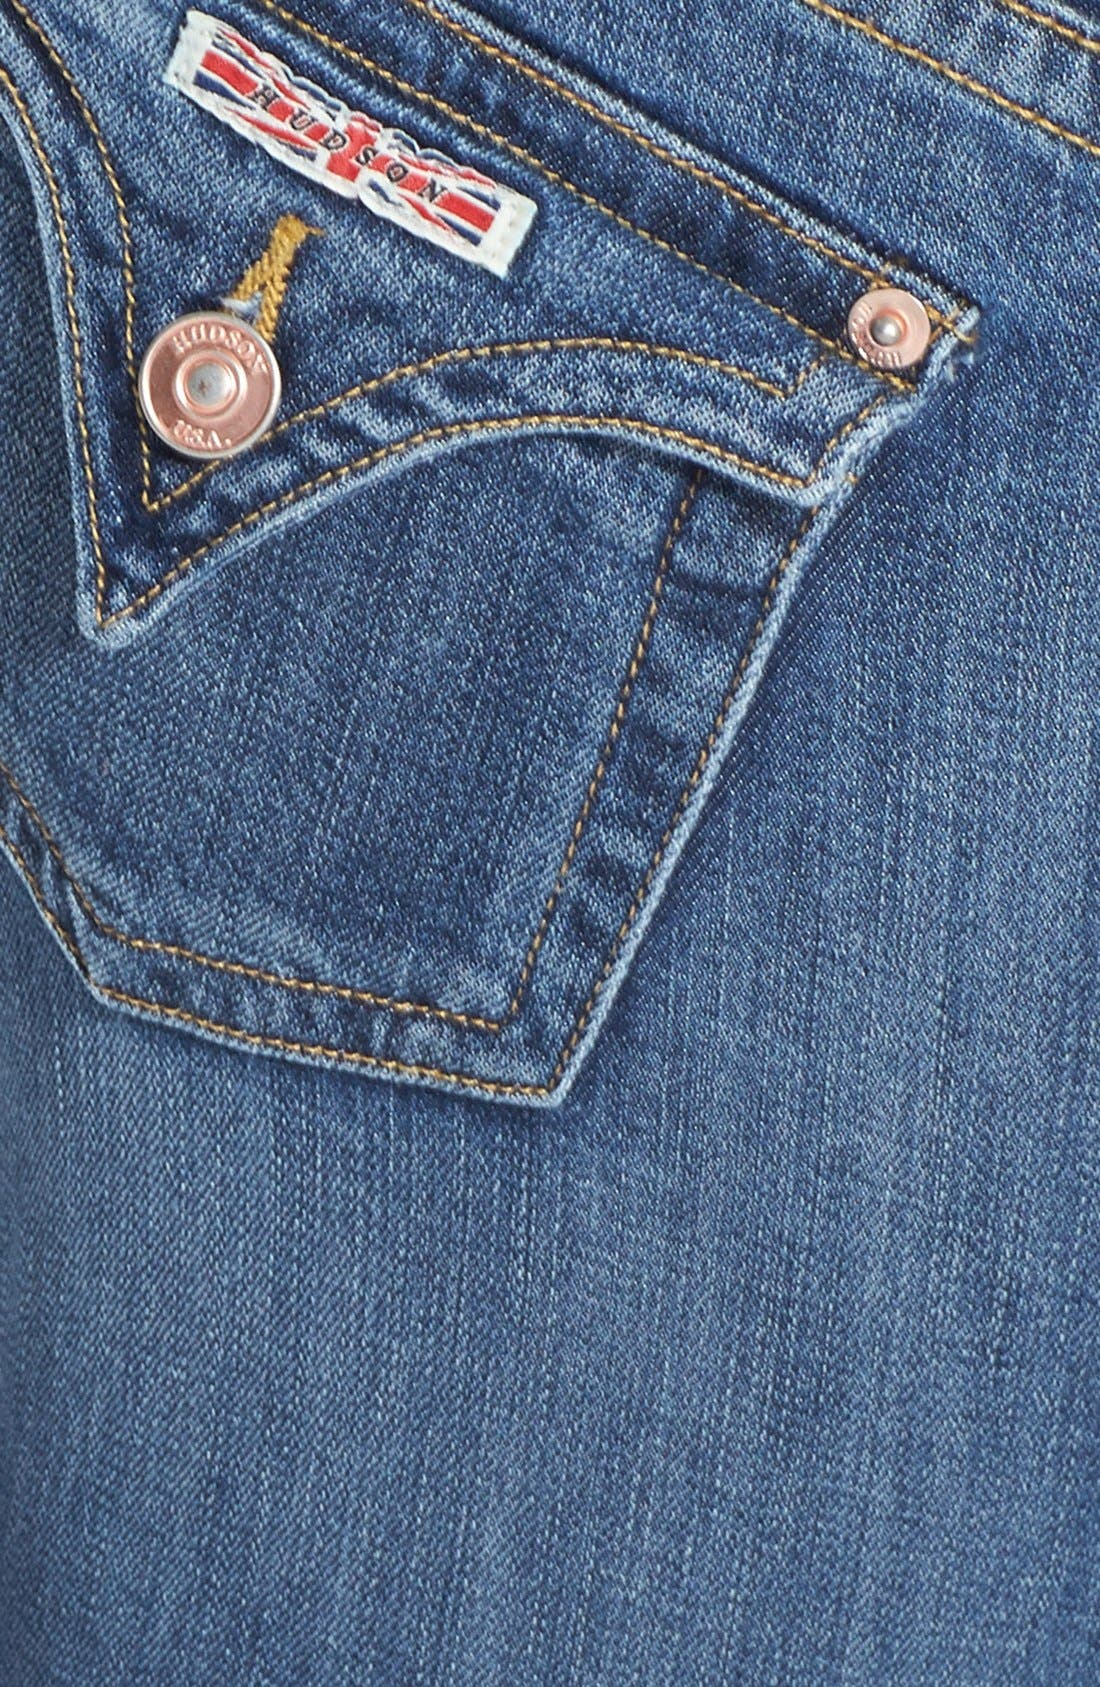 Alternate Image 3  - Hudson Jeans 'Signature' Bootcut Jeans (Hackney) (Petite)